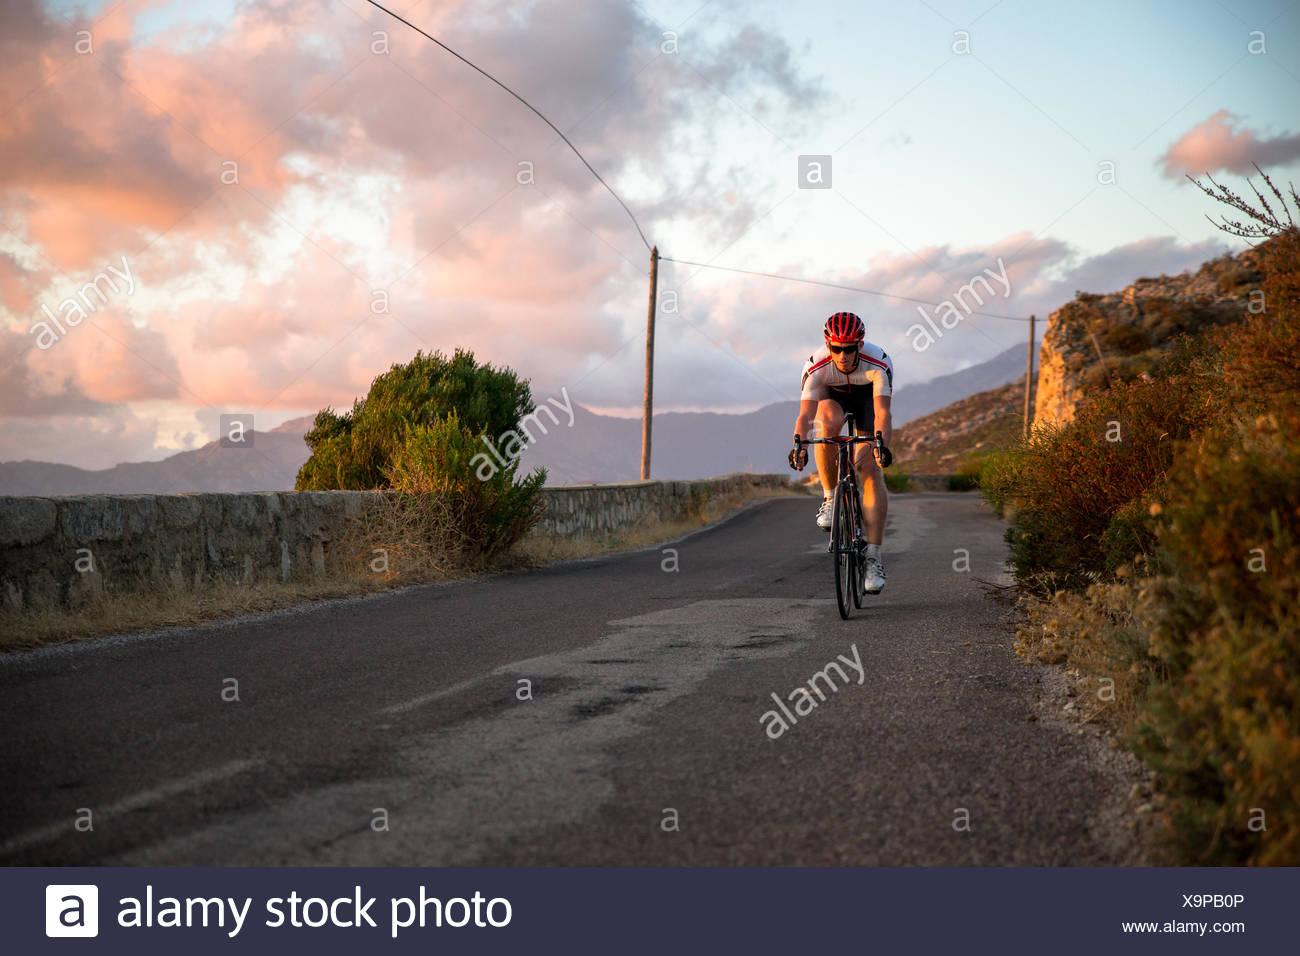 Francia, Córcega, el ciclismo de carretera sobre el mar al atardecer Imagen De Stock